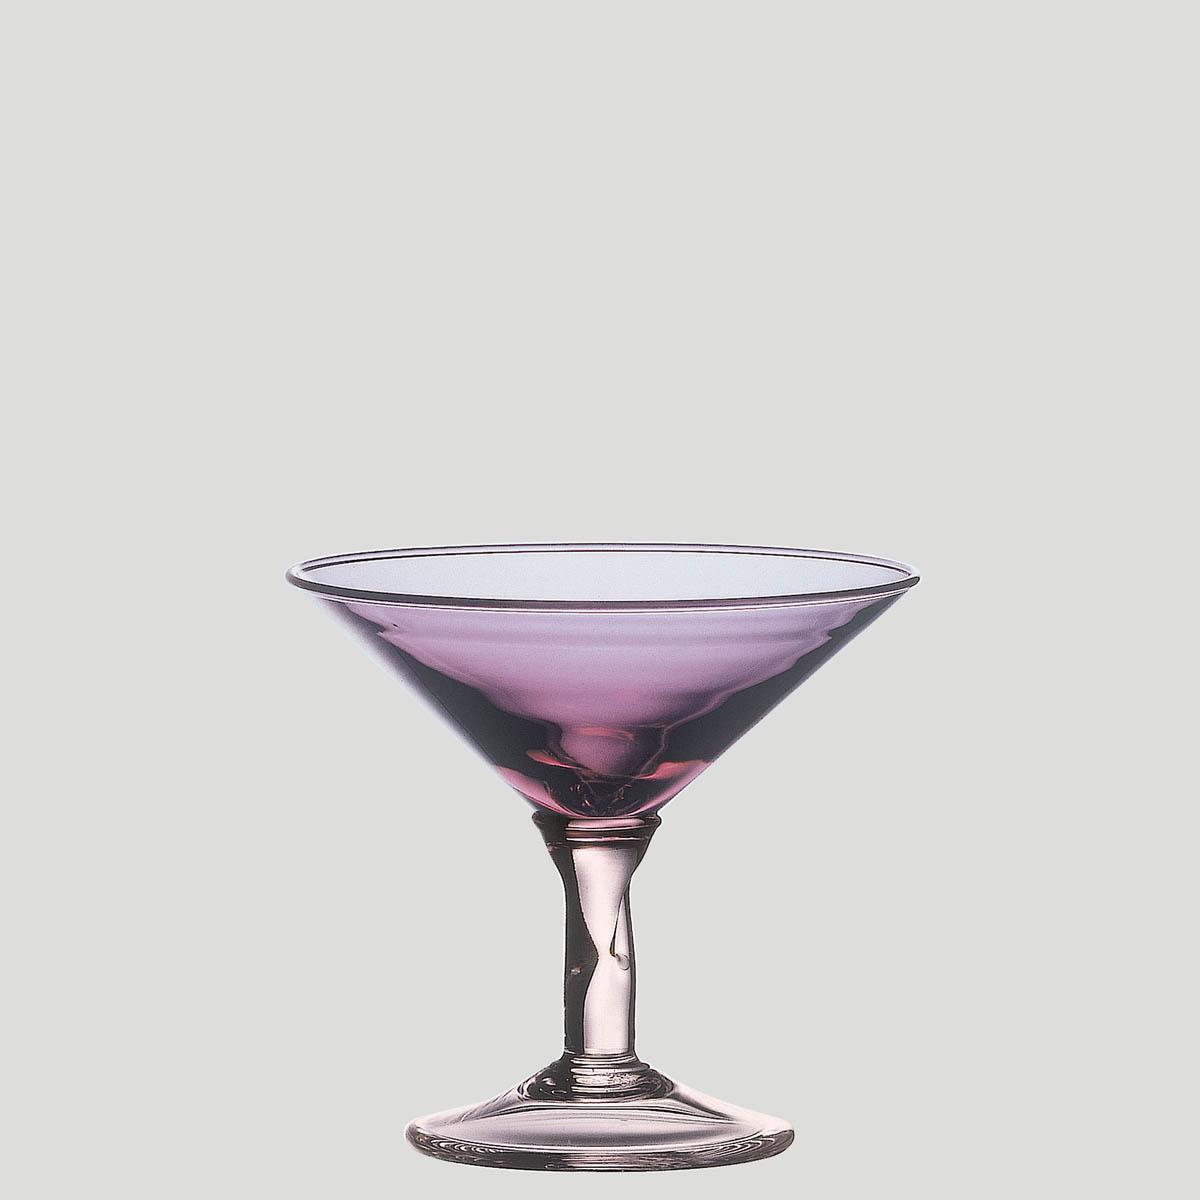 Vienna Grande - Coppa per gelato in vetro - Gardagel